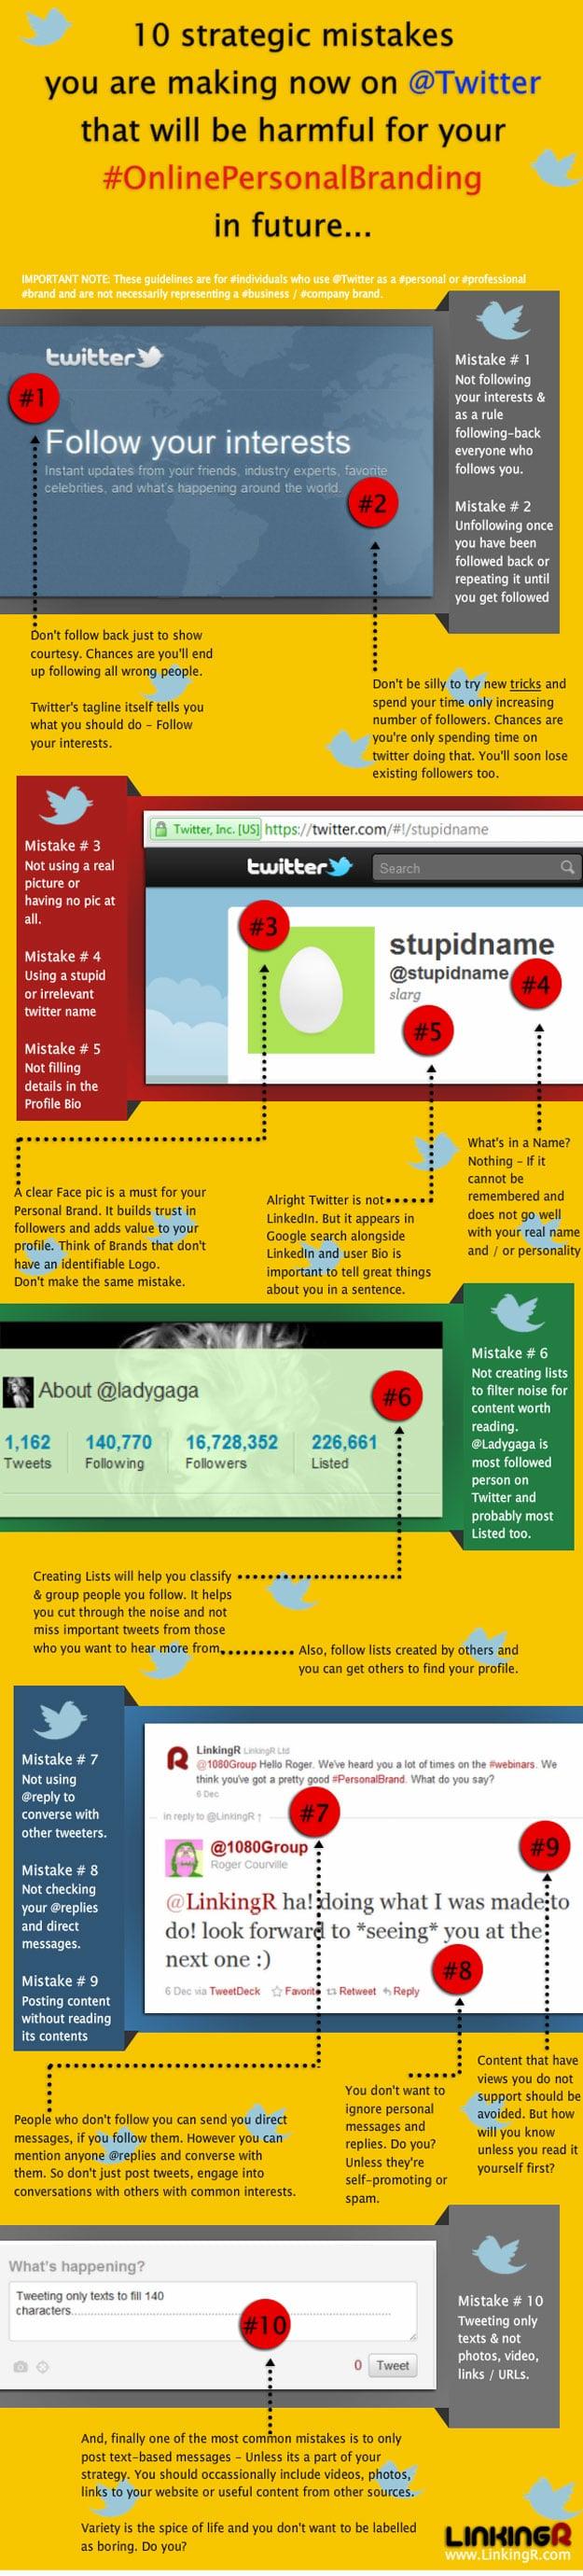 Twitter-Online-Branding-Mistakes-infographic